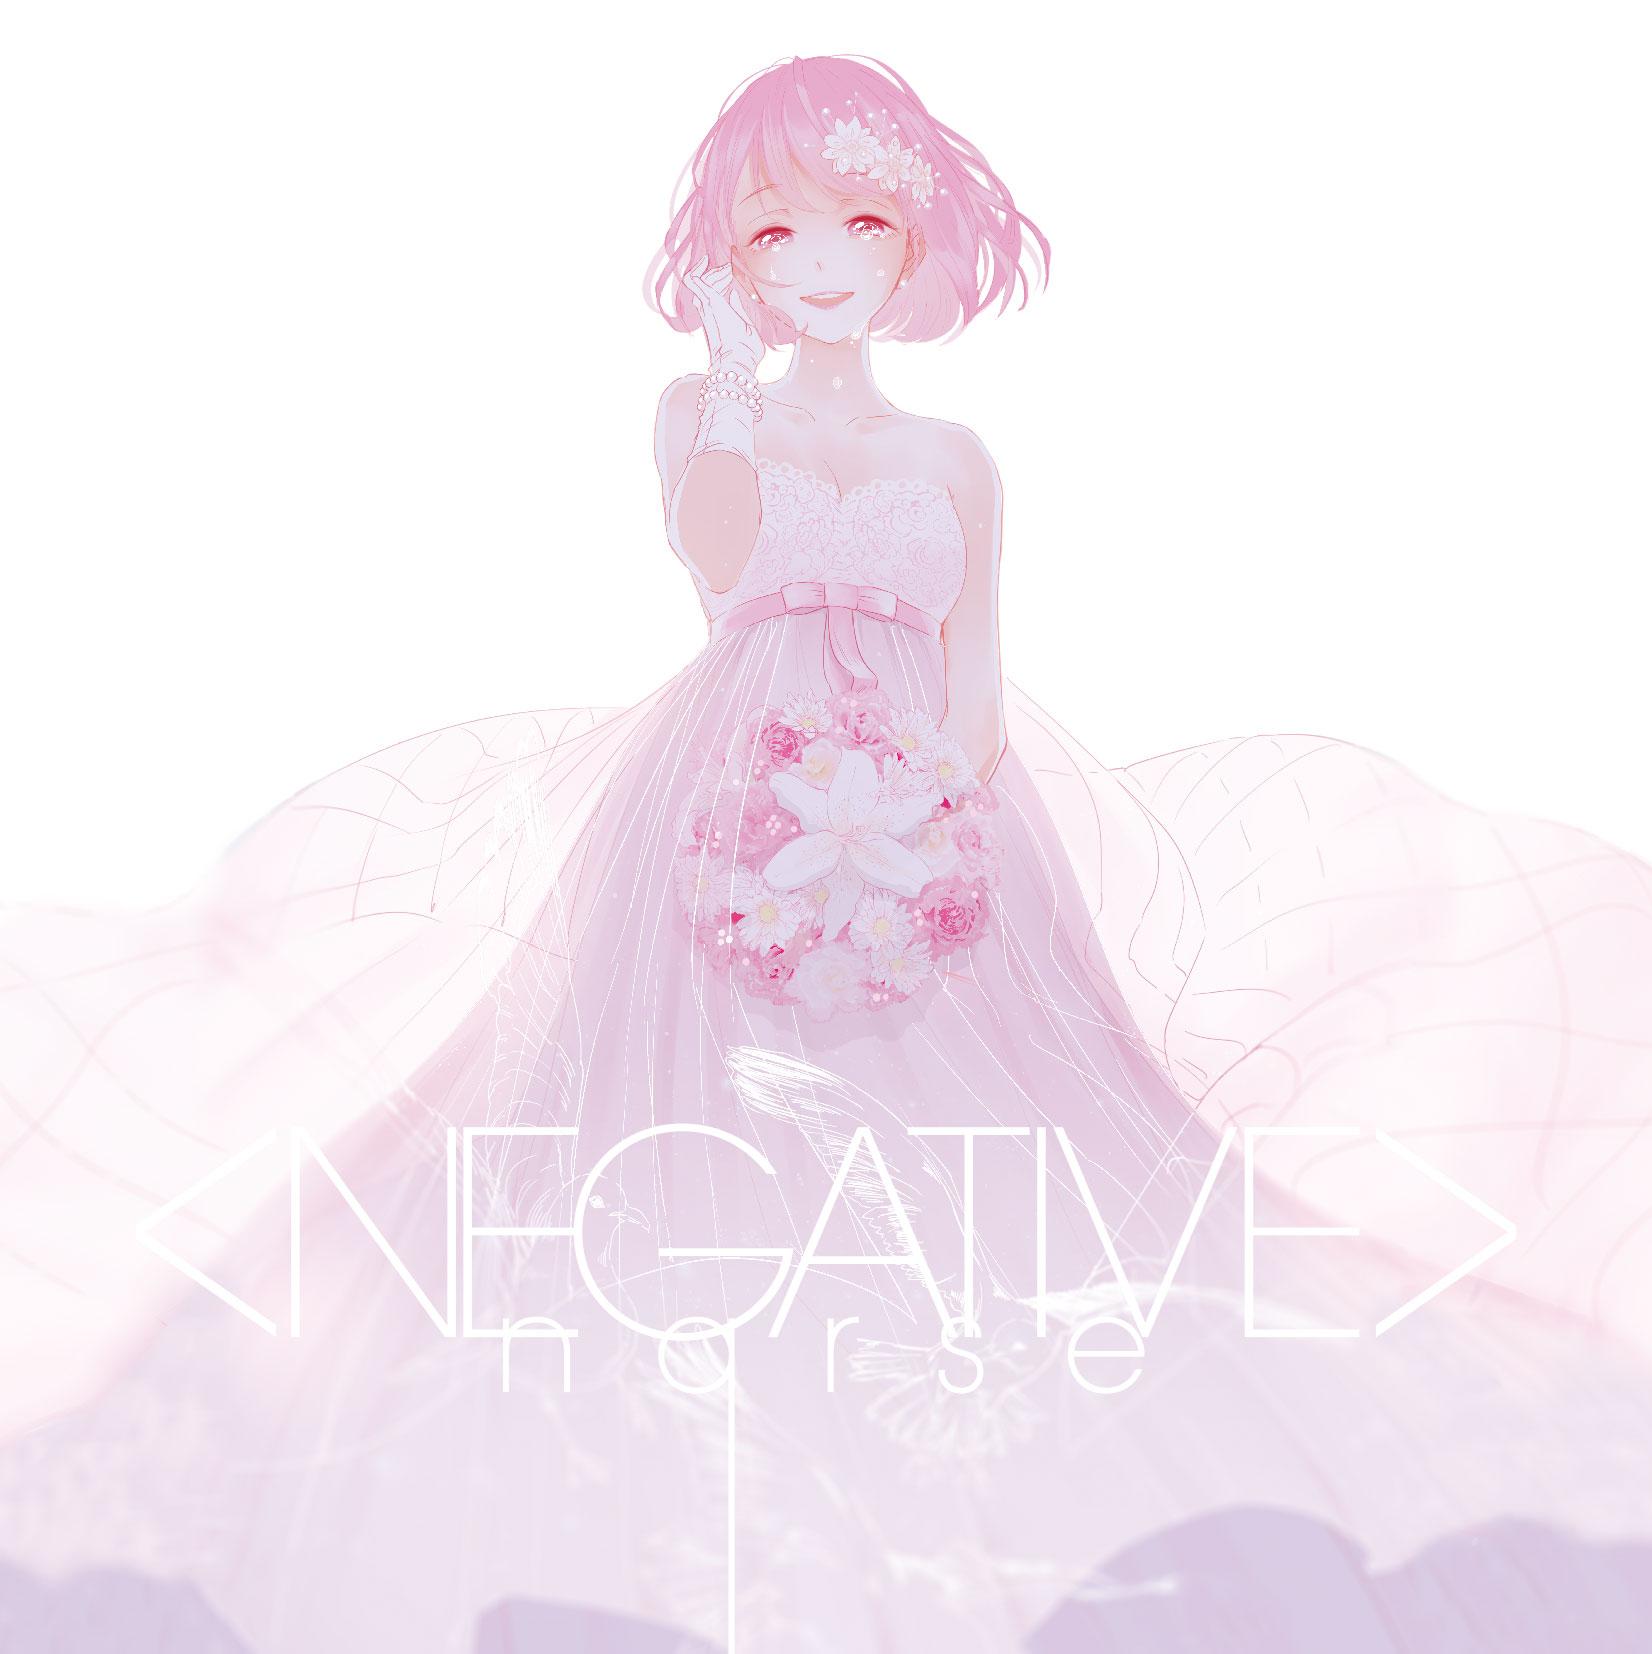 【nqrse】新進気鋭のラッパー/ボーカル